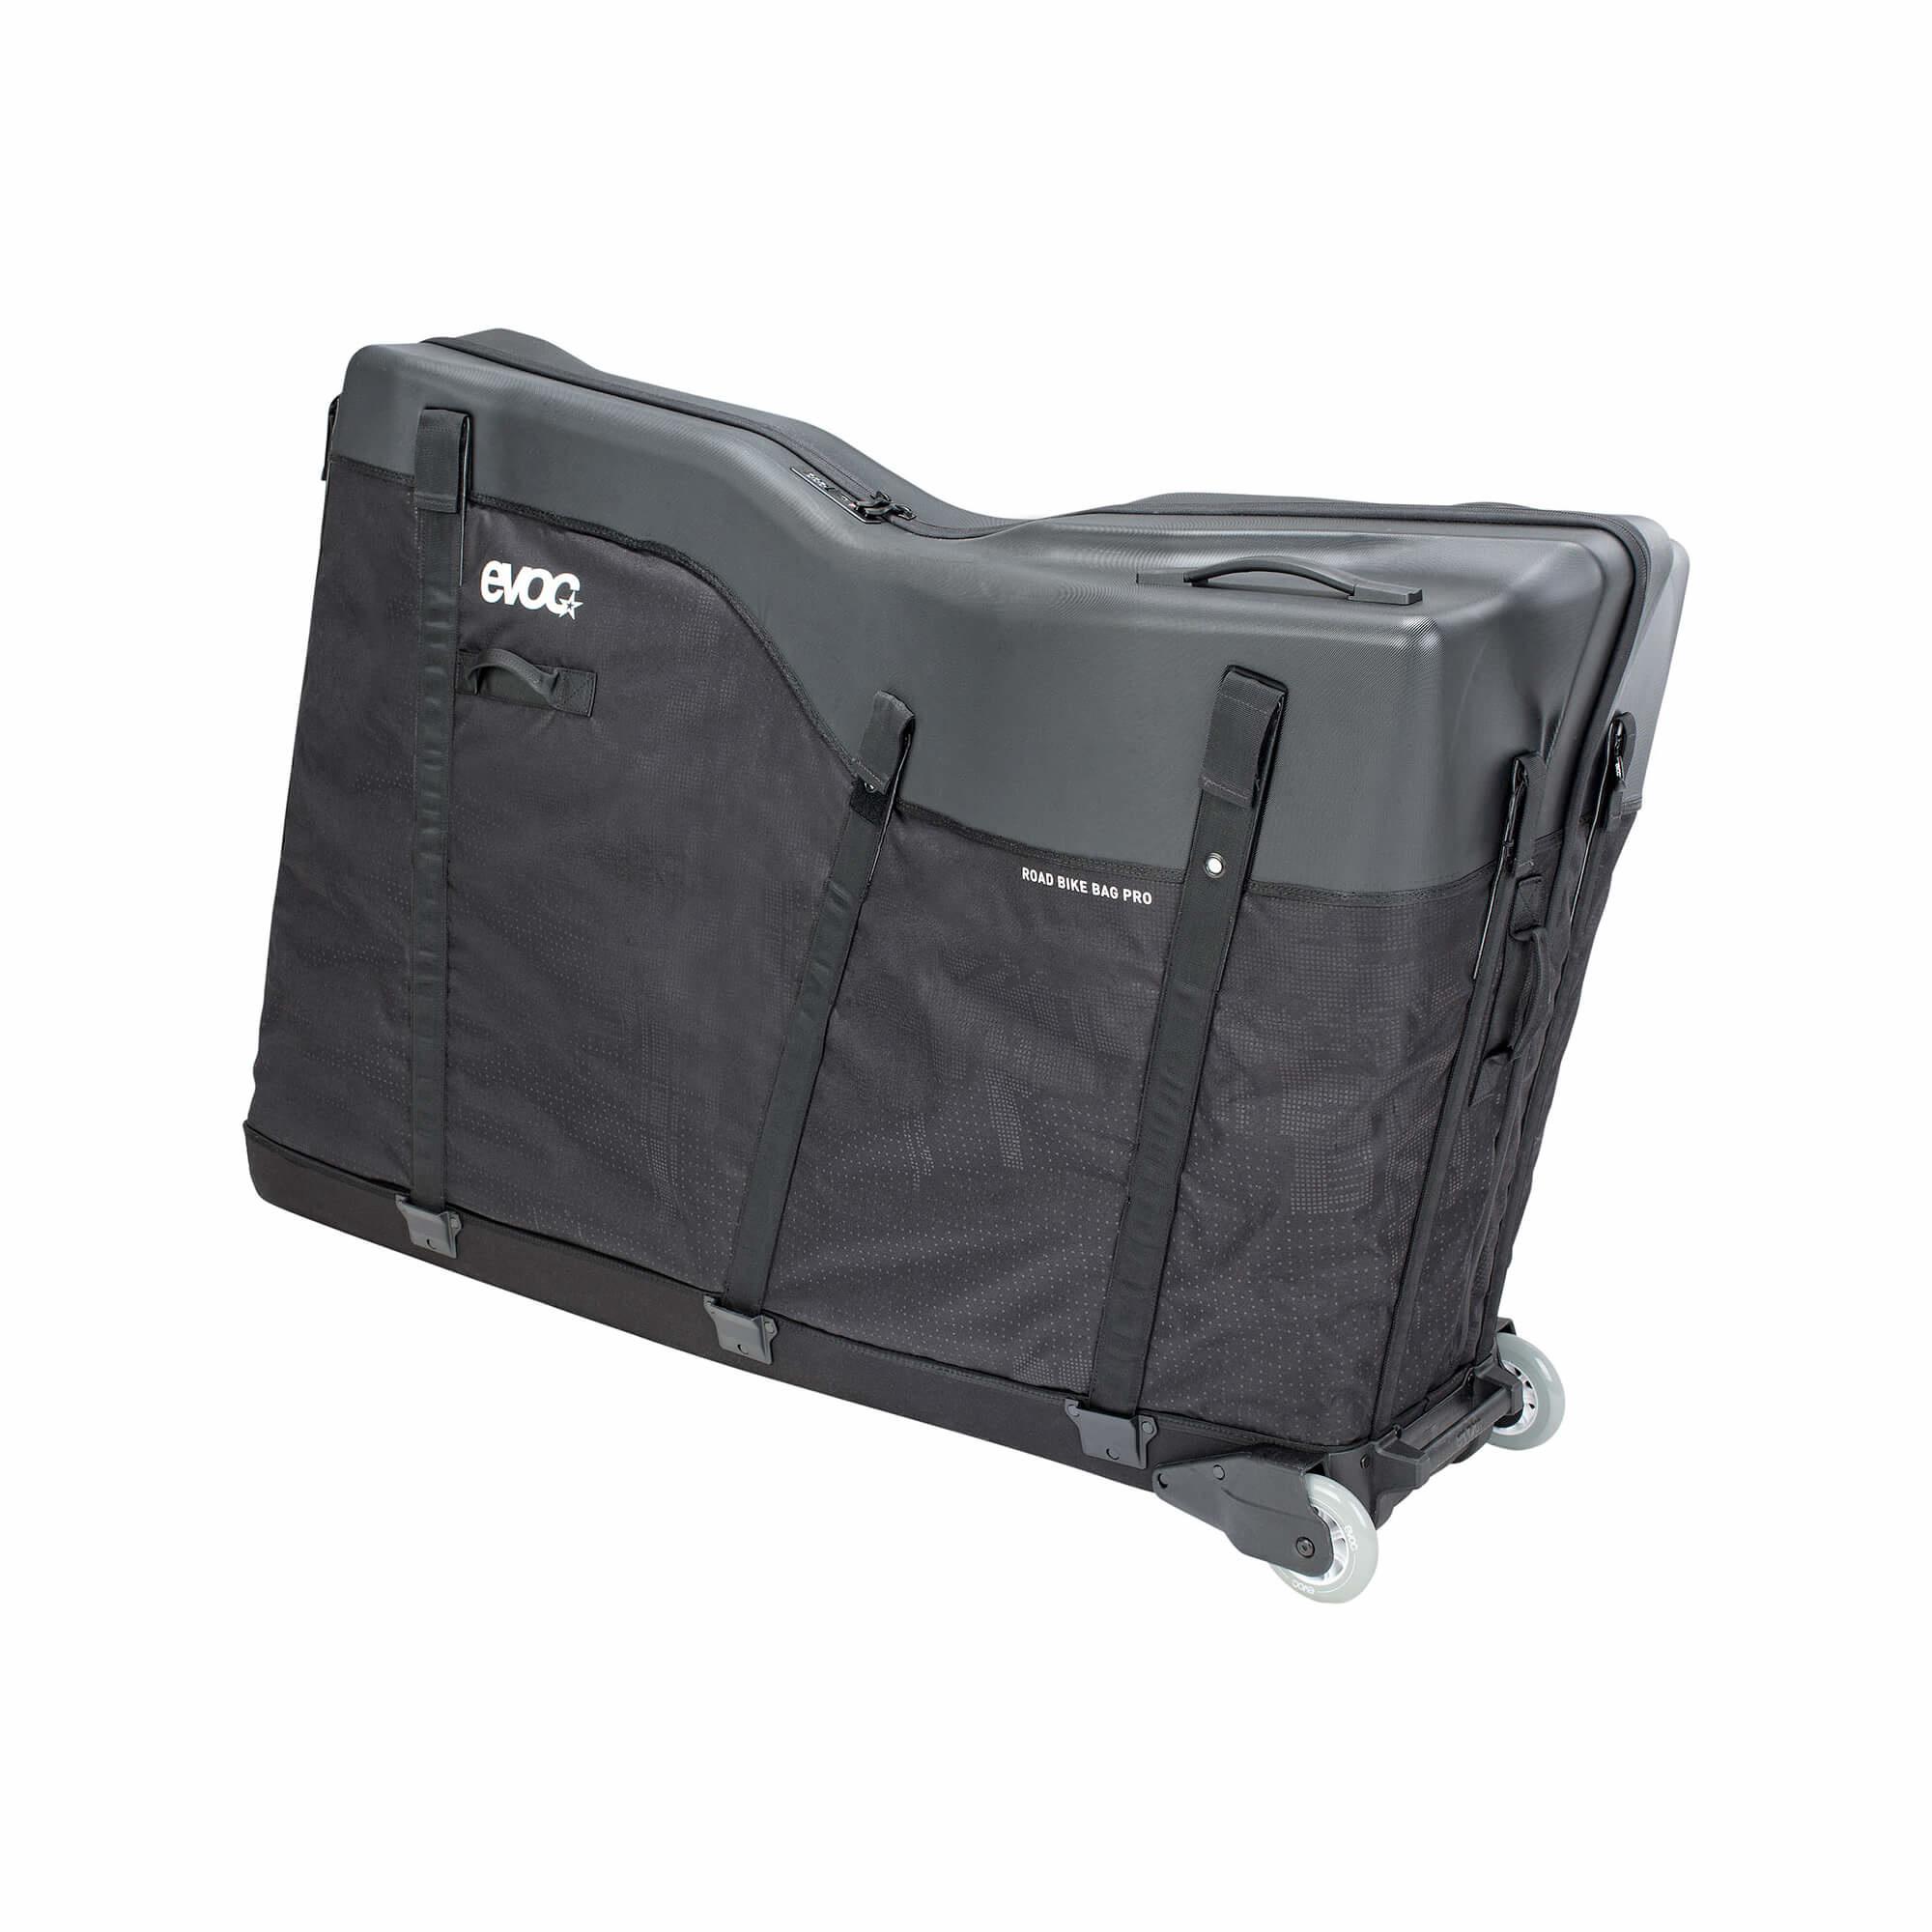 Road Bike Bag Pro Black-3